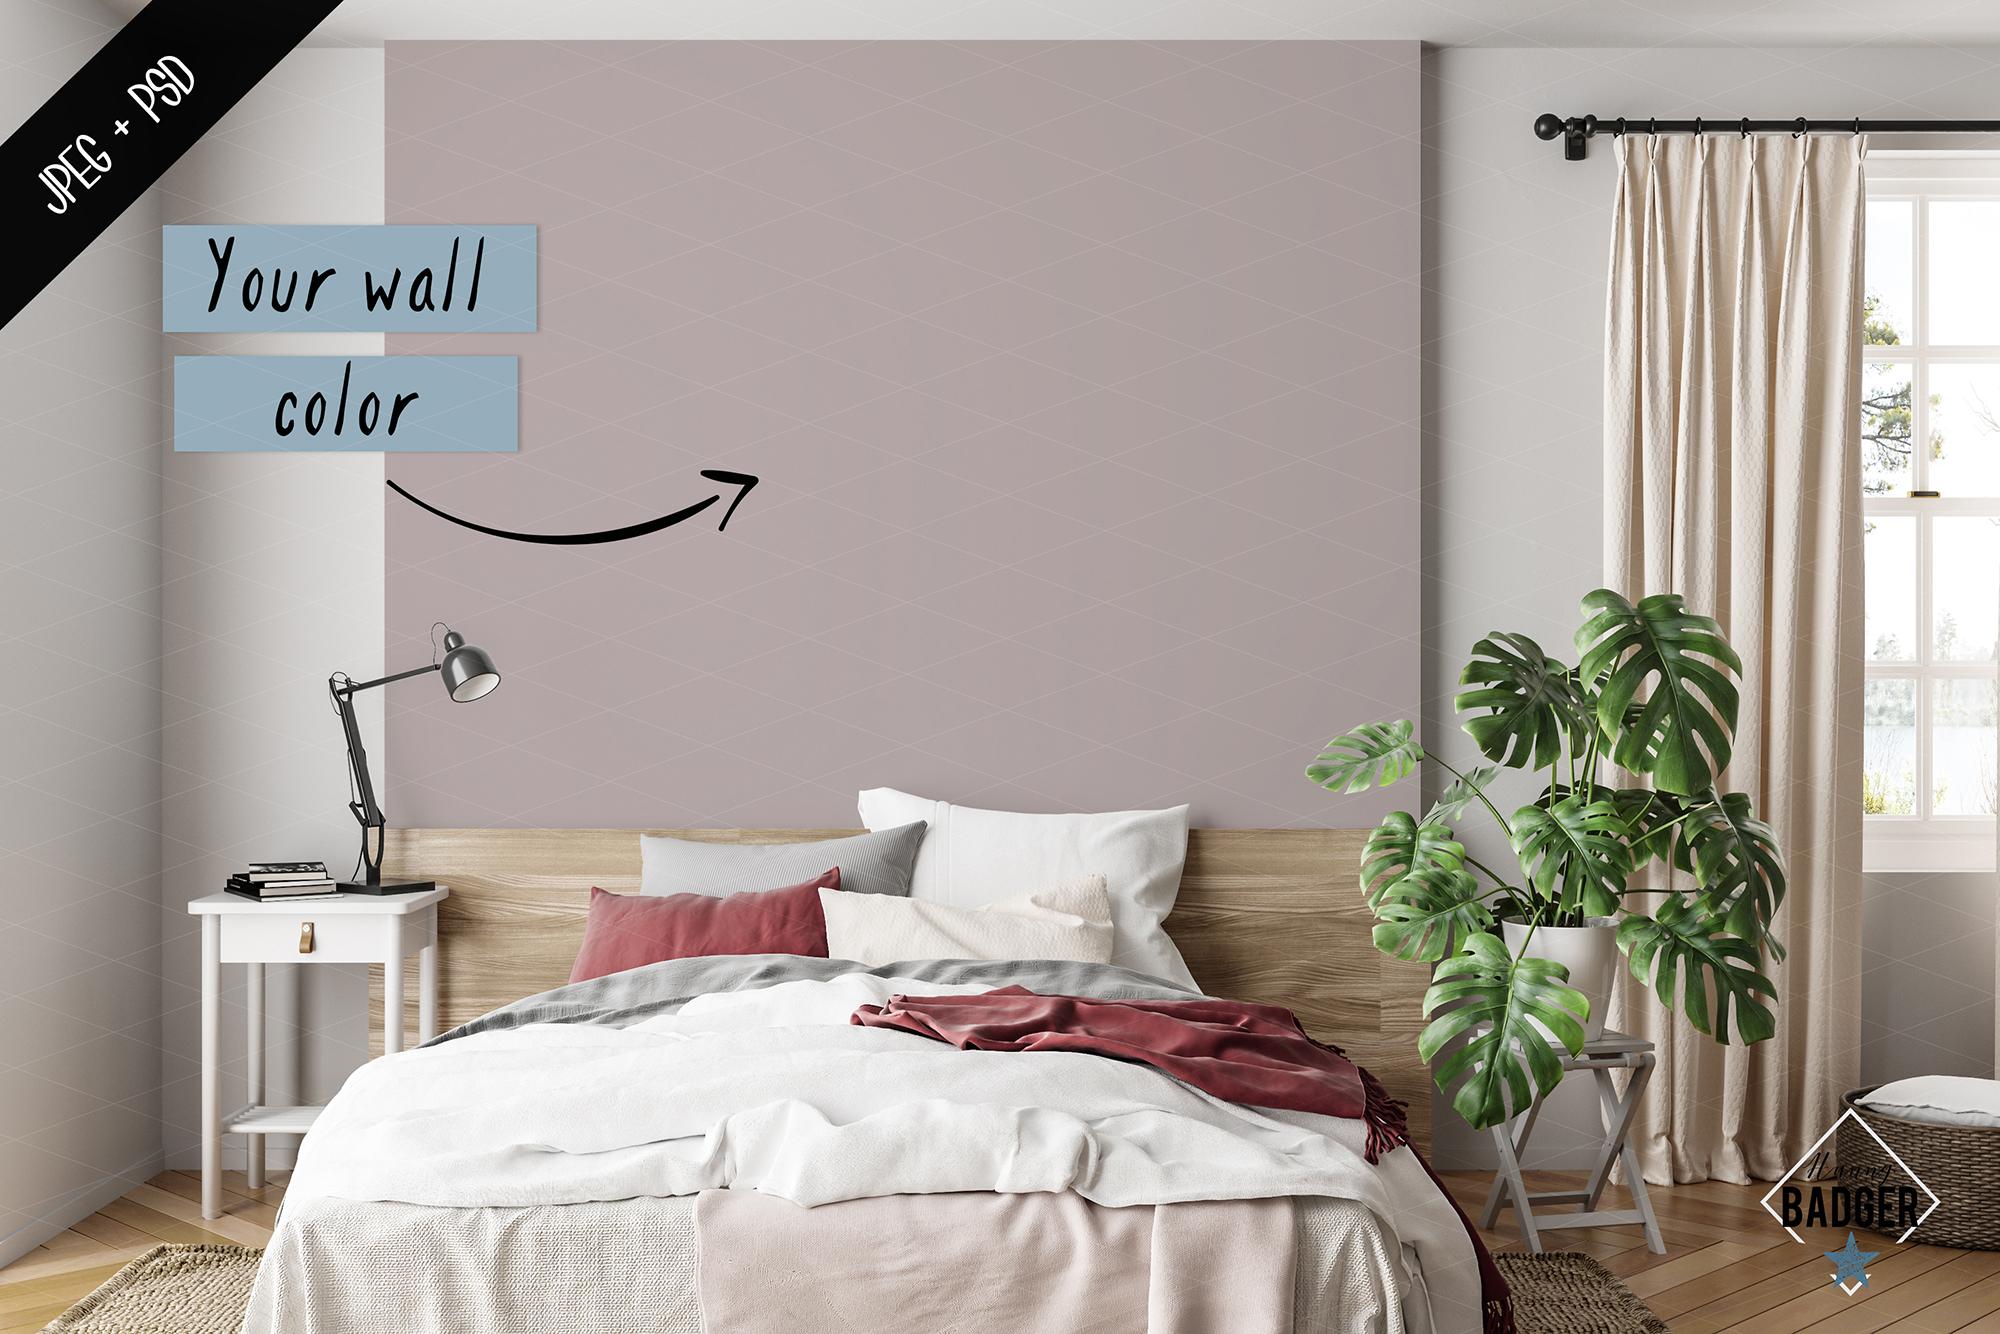 Interior mockup BUNDLE - frame & wall mockup creator example image 8